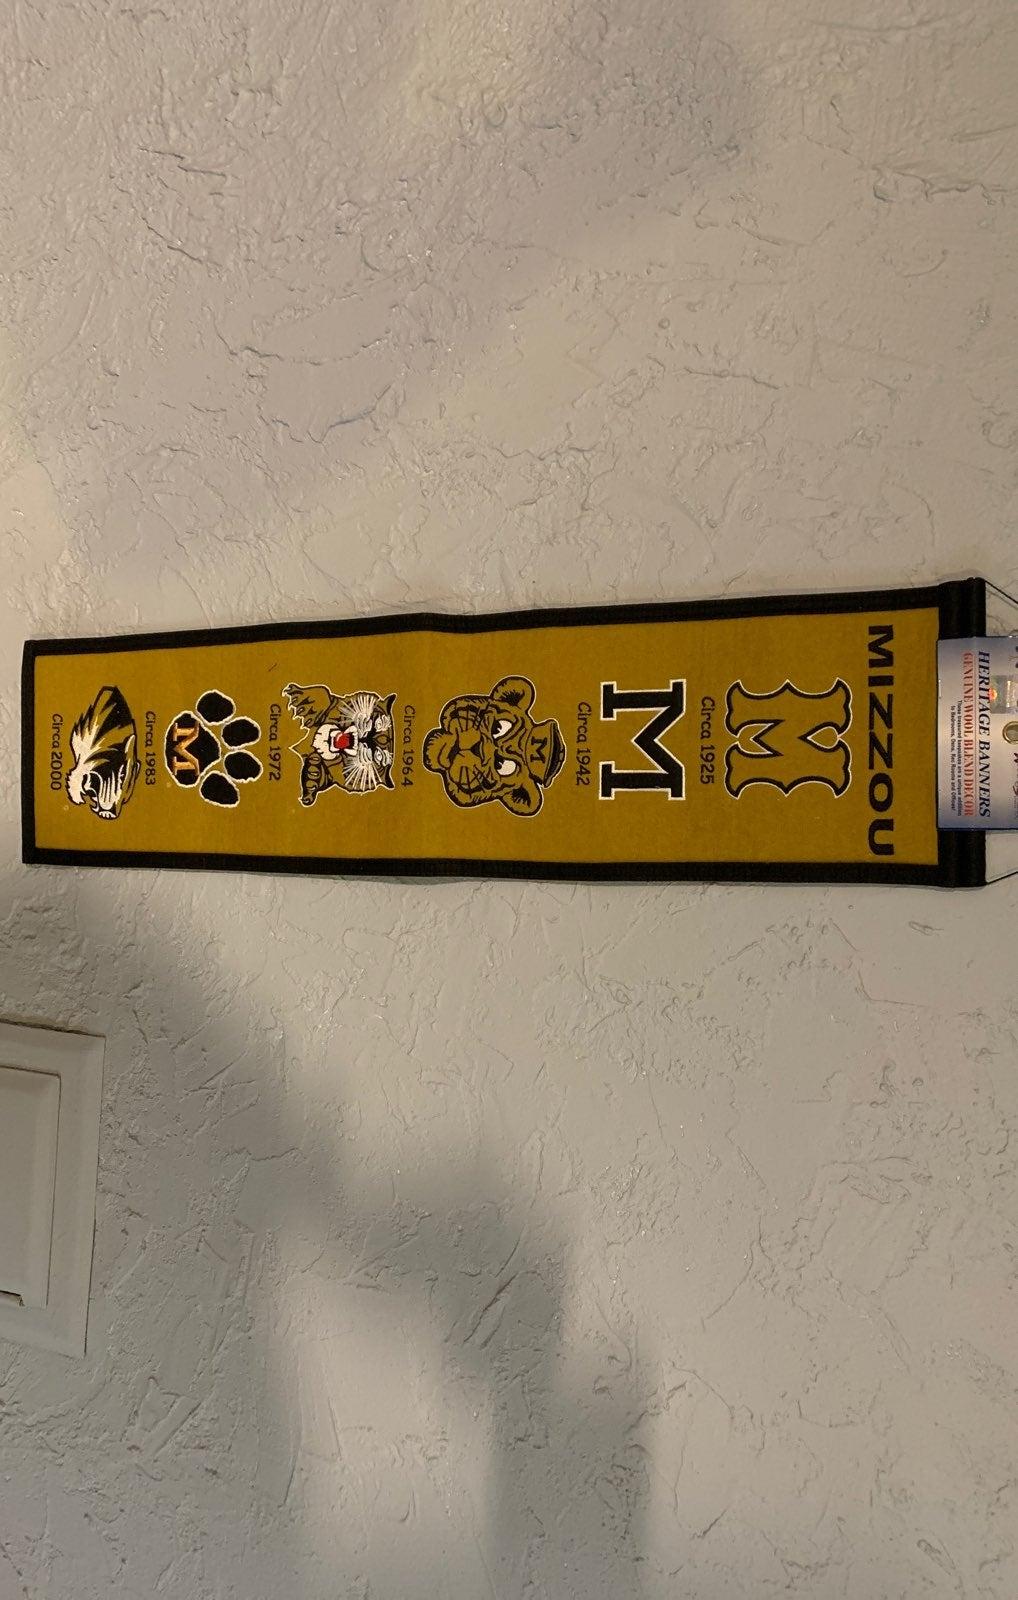 Mizzou Banner heritage brand new